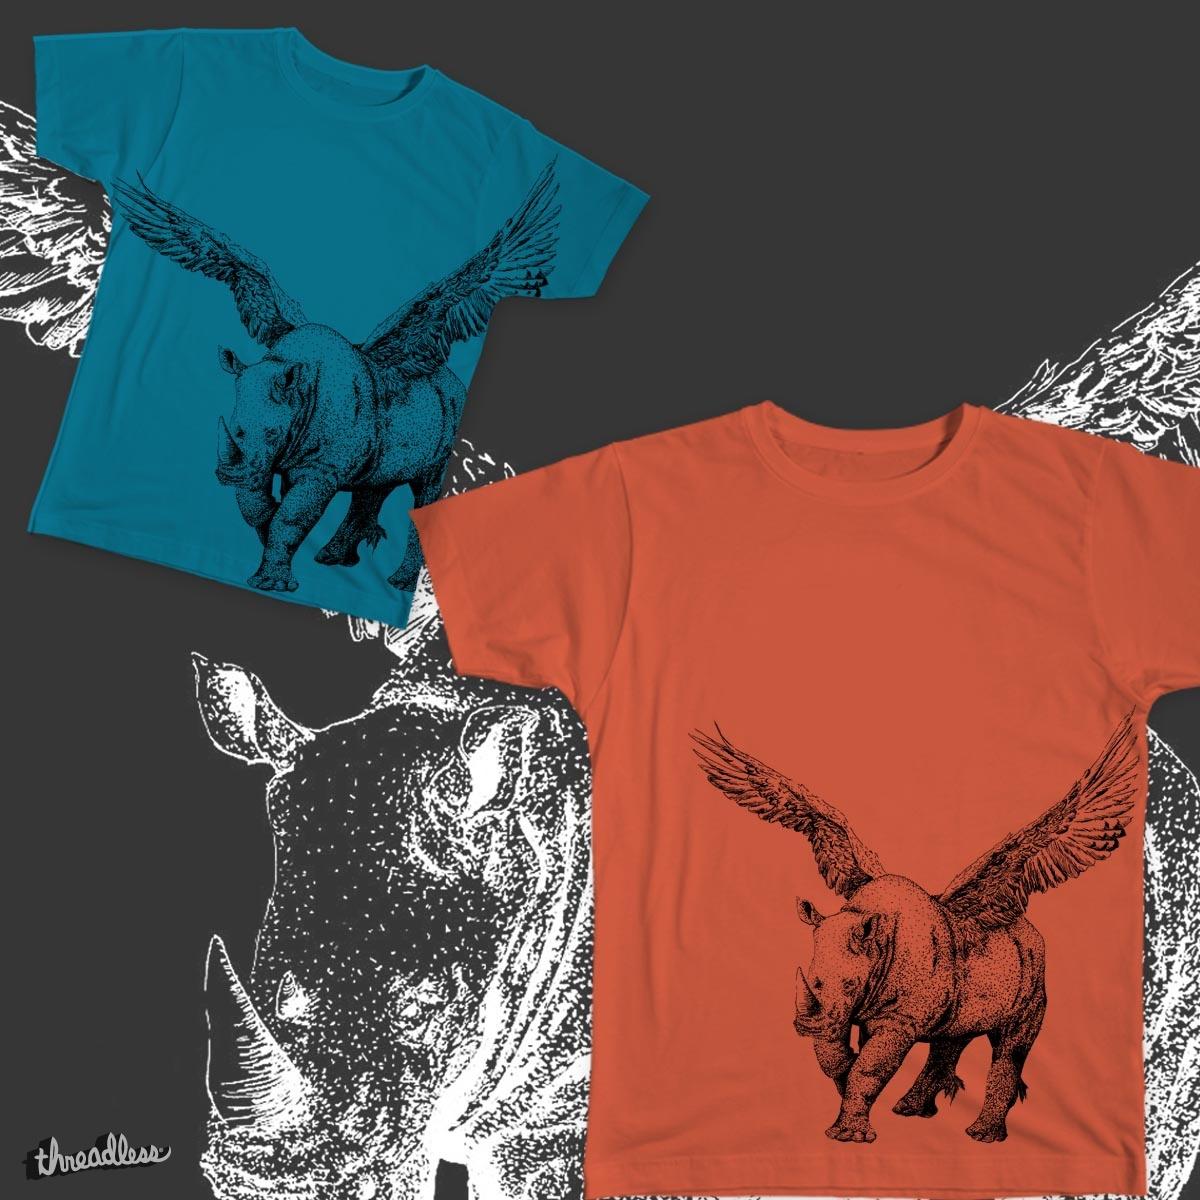 Reagle (Rhino+Eagle) by KissMyArtse on Threadless